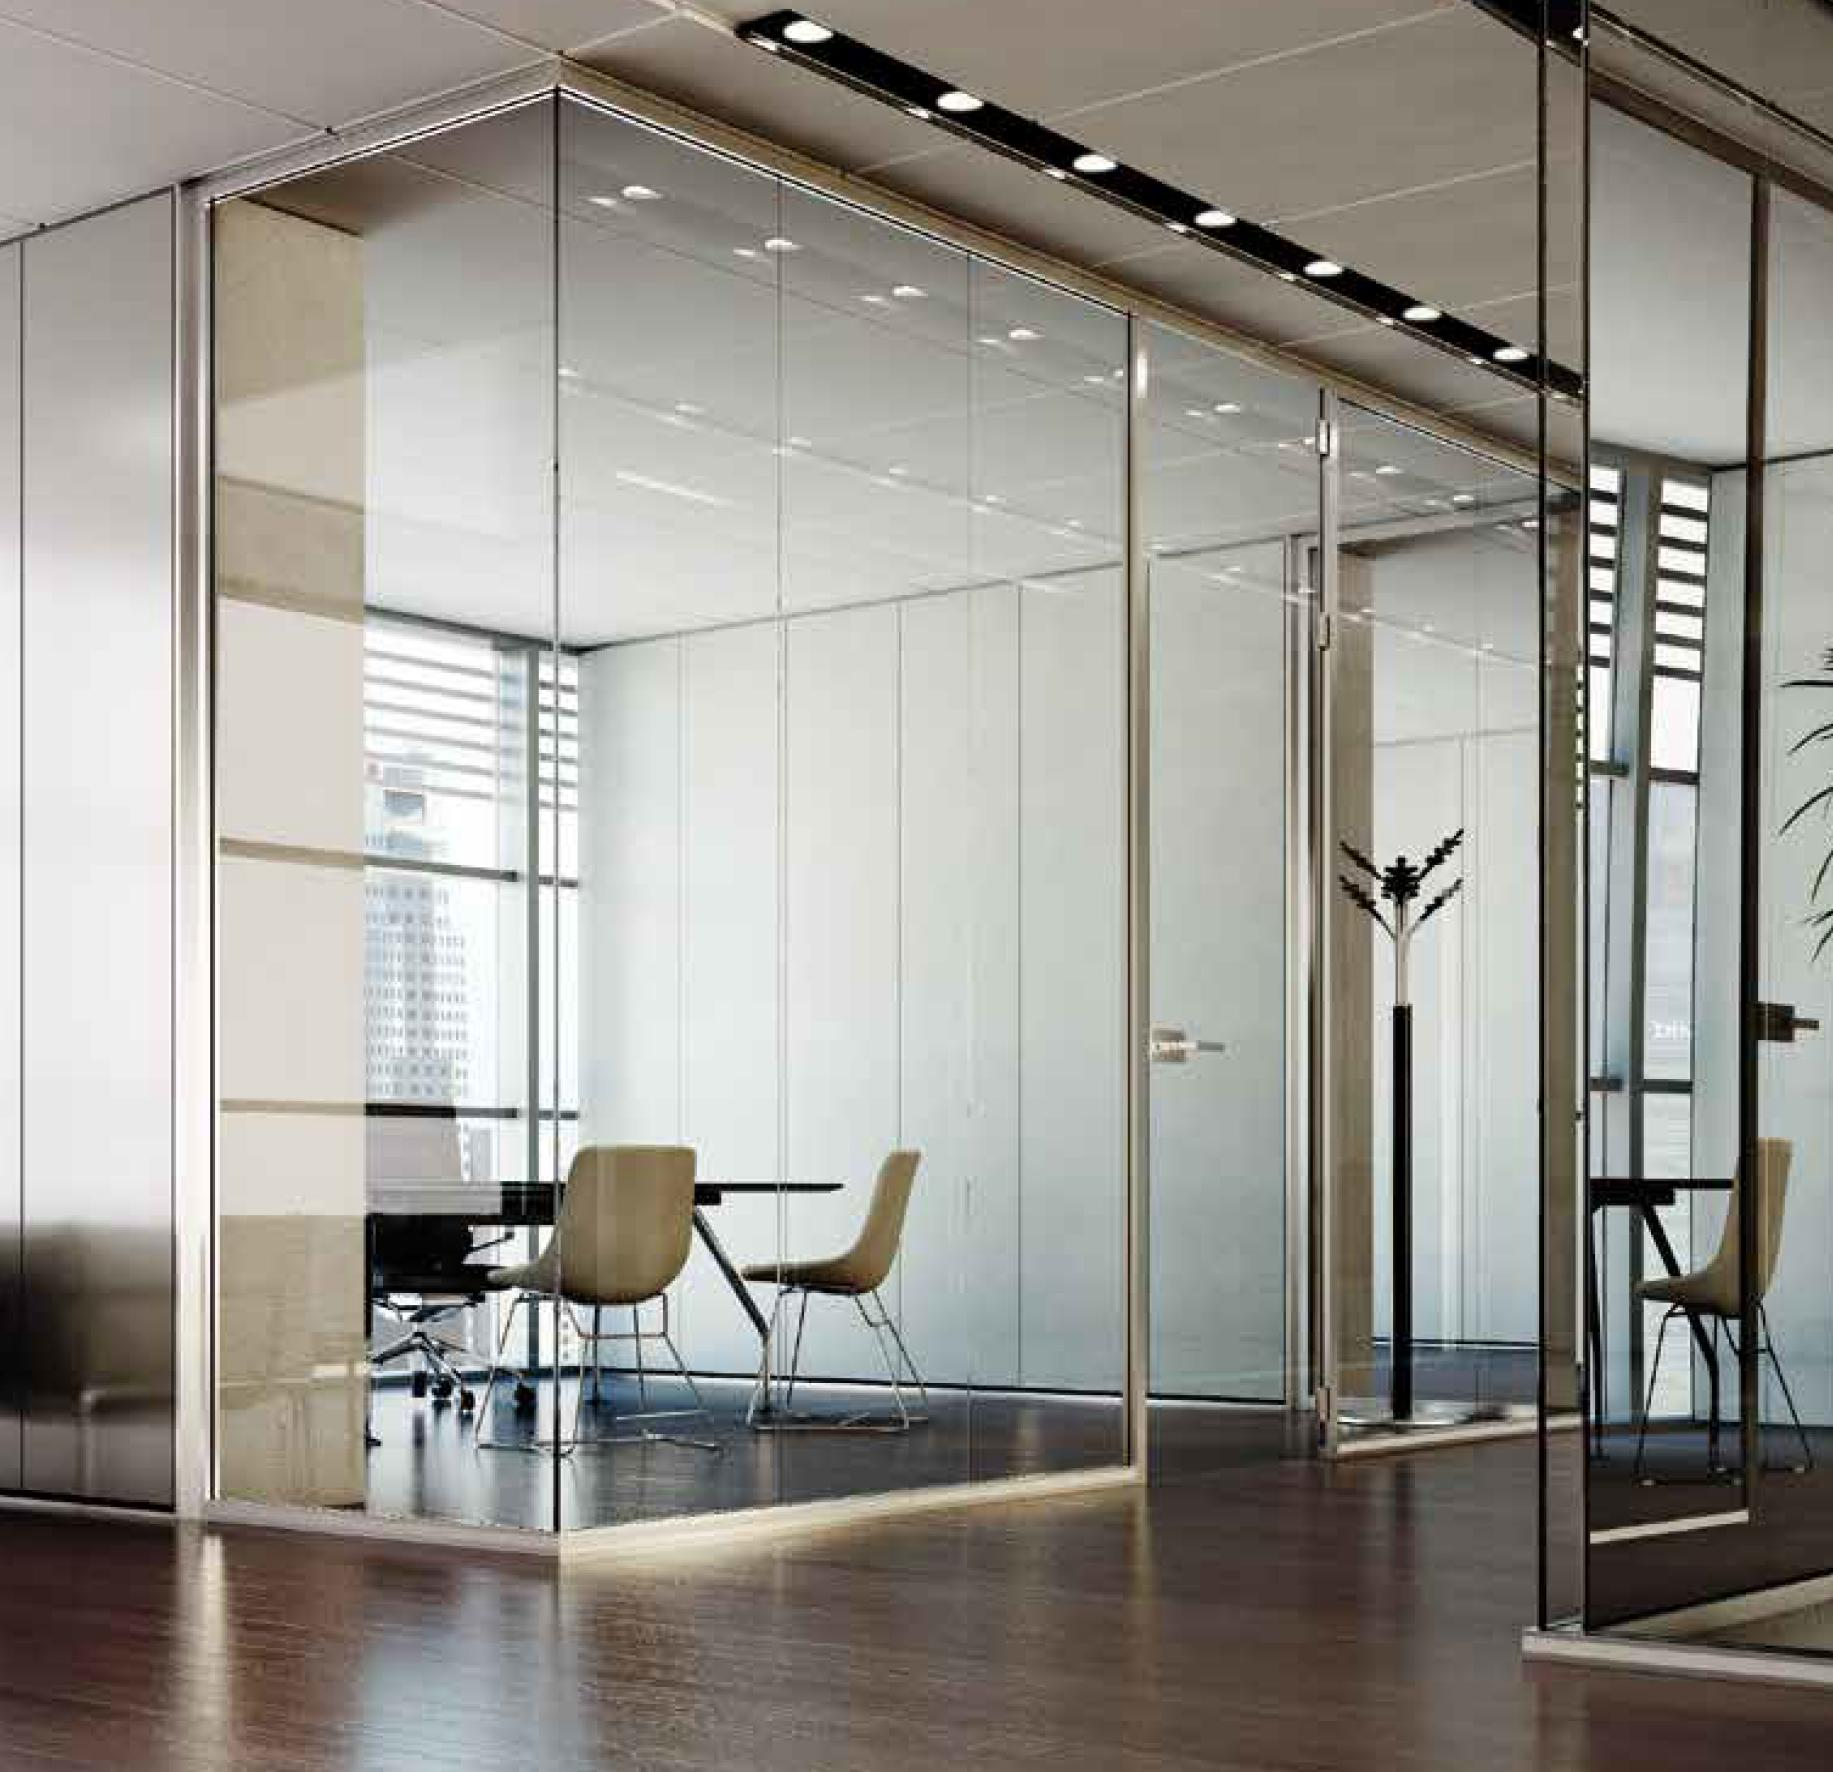 Pareti ventilate facciate continue pareti vetro pareti divisorie for Pareti divisorie mobili per interni